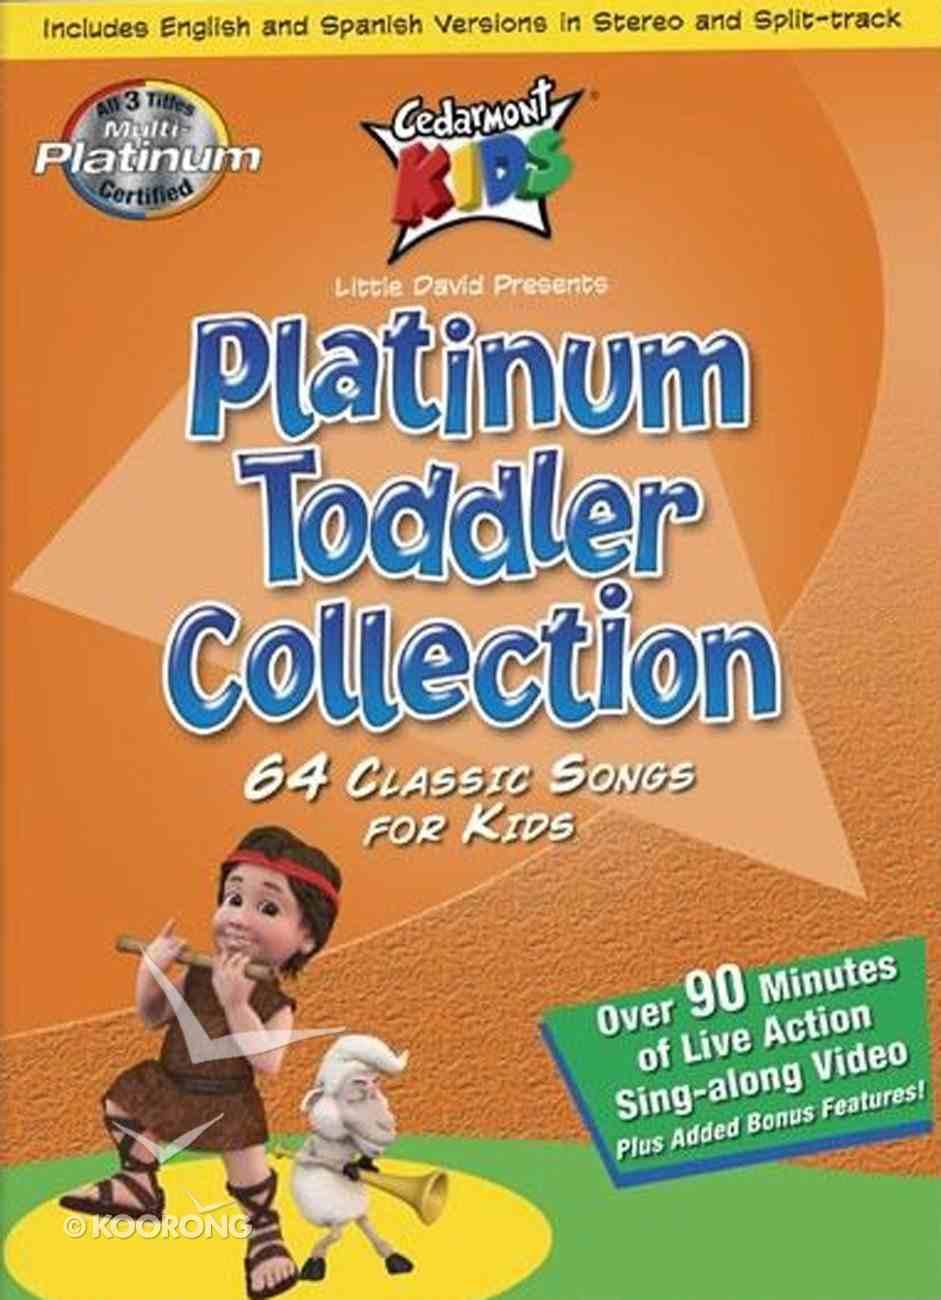 Toddler Platinum Collection (Kids Classics Series) DVD